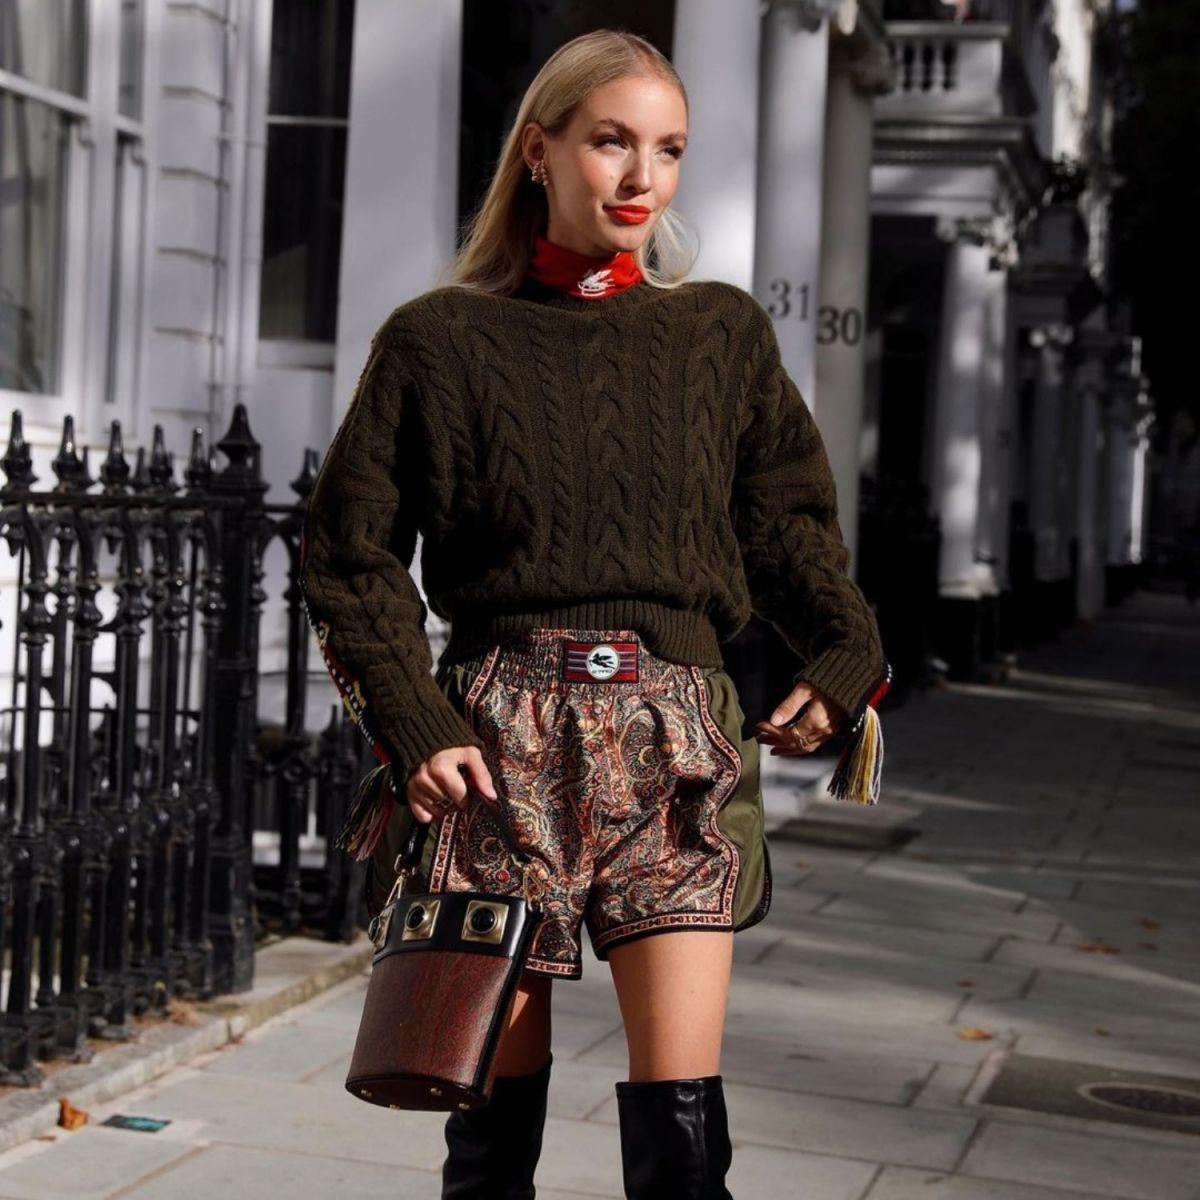 Sweater Weather: Τα αγαπημένα μας πουλόβερ από ελληνικά και ξένα brands που έχουμε ξεχωρίσει